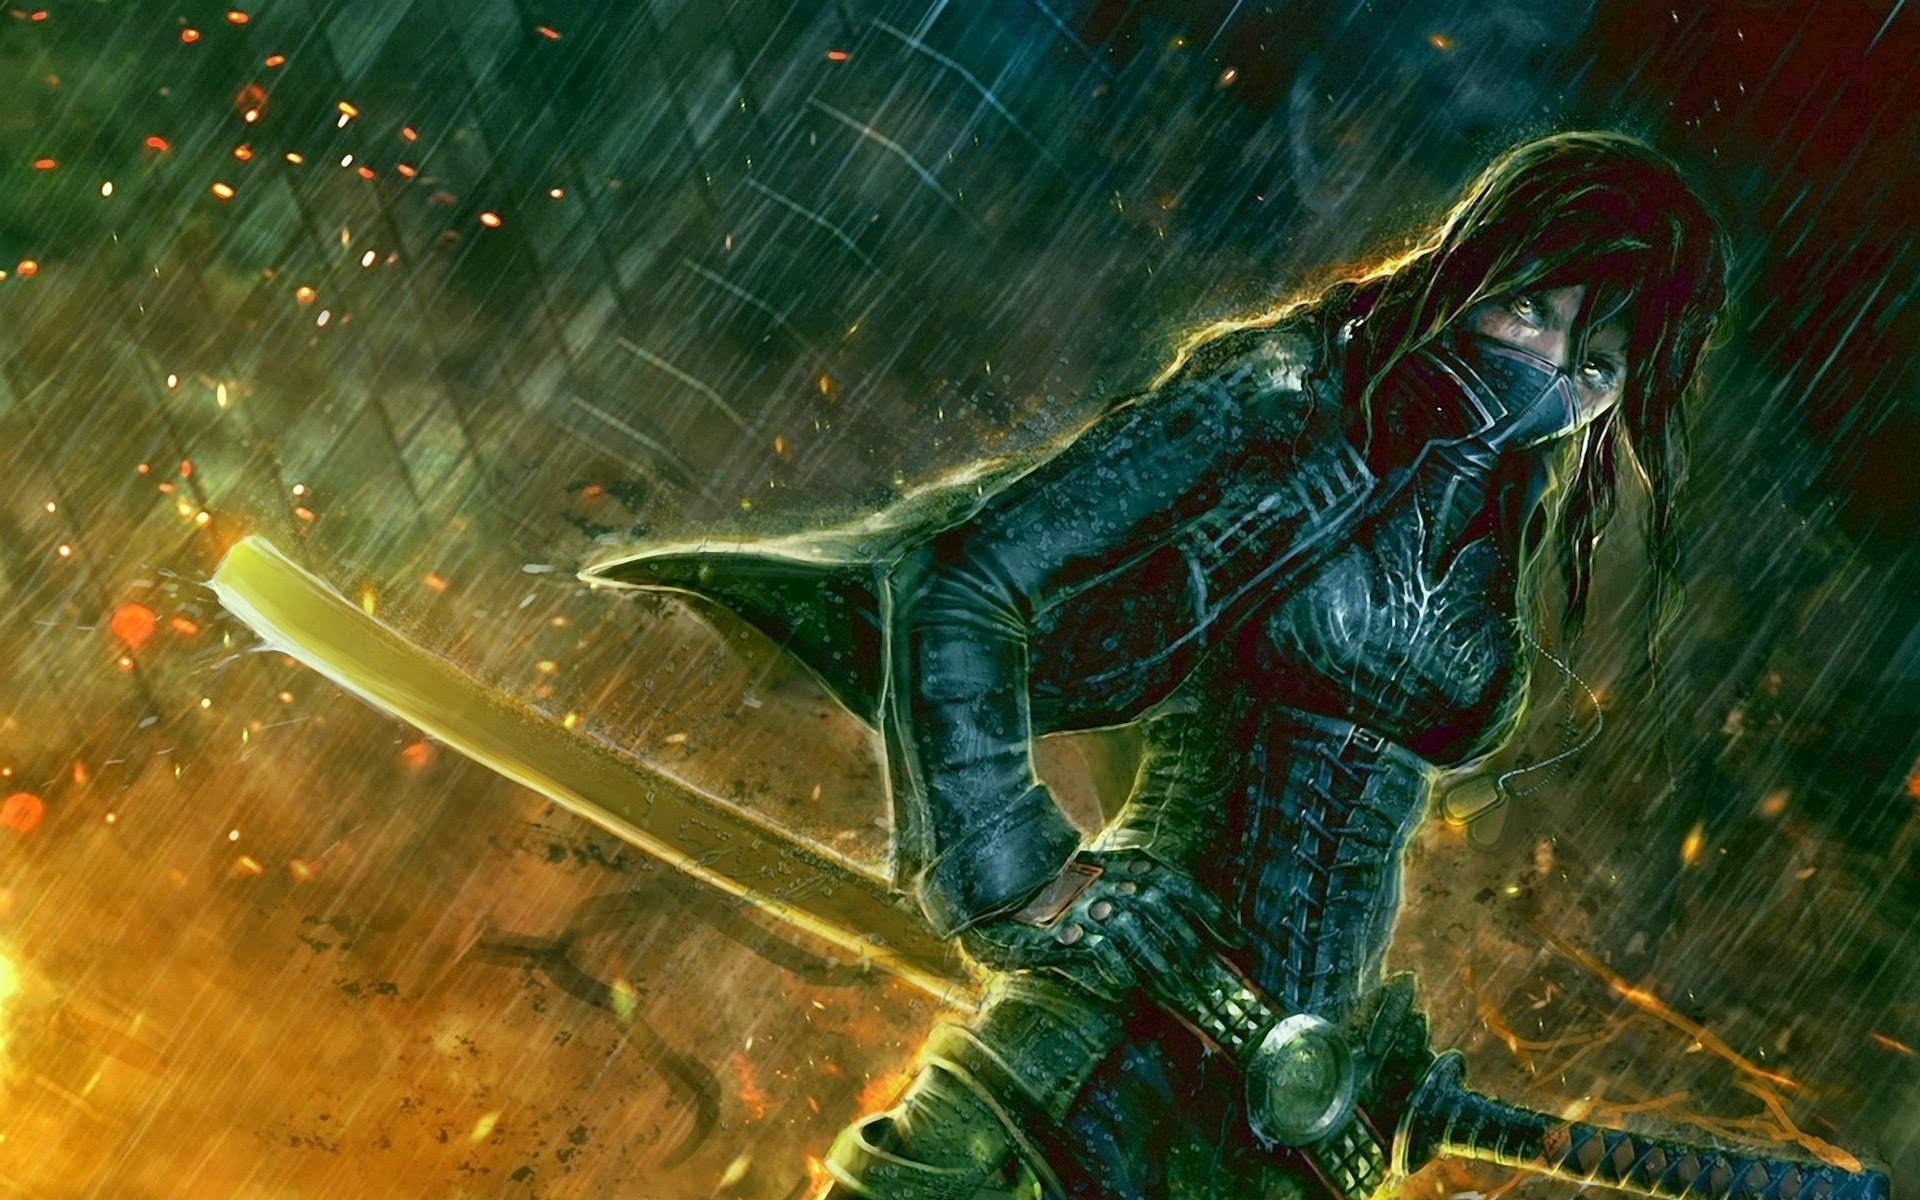 fantasy Art, Demoness, Demon Hunter, World Of Warcraft Wallpaper HD